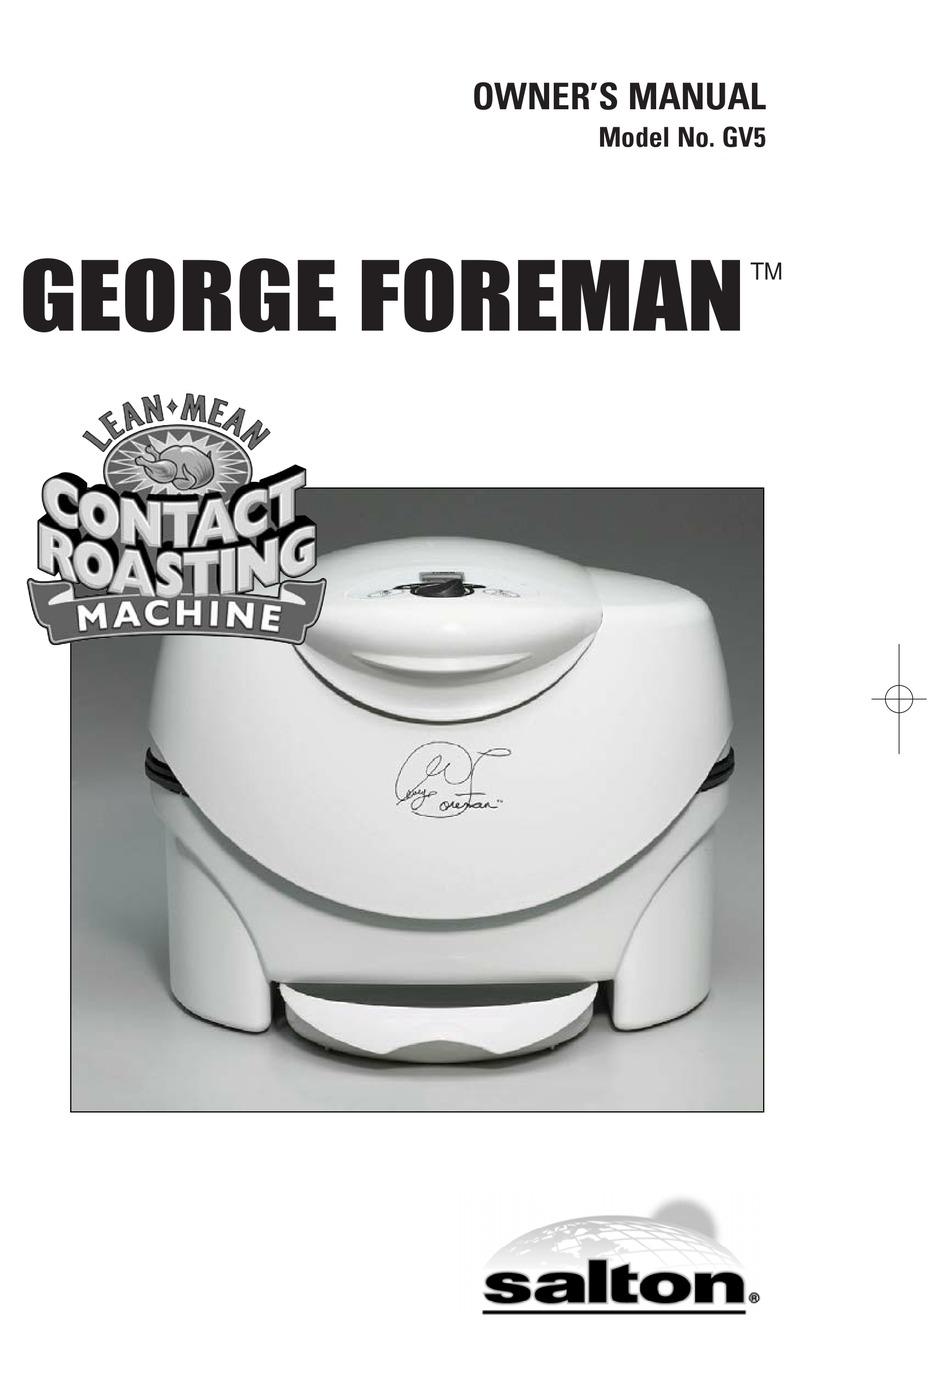 George Foreman Gv5 Owner S Manual Pdf Download Manualslib